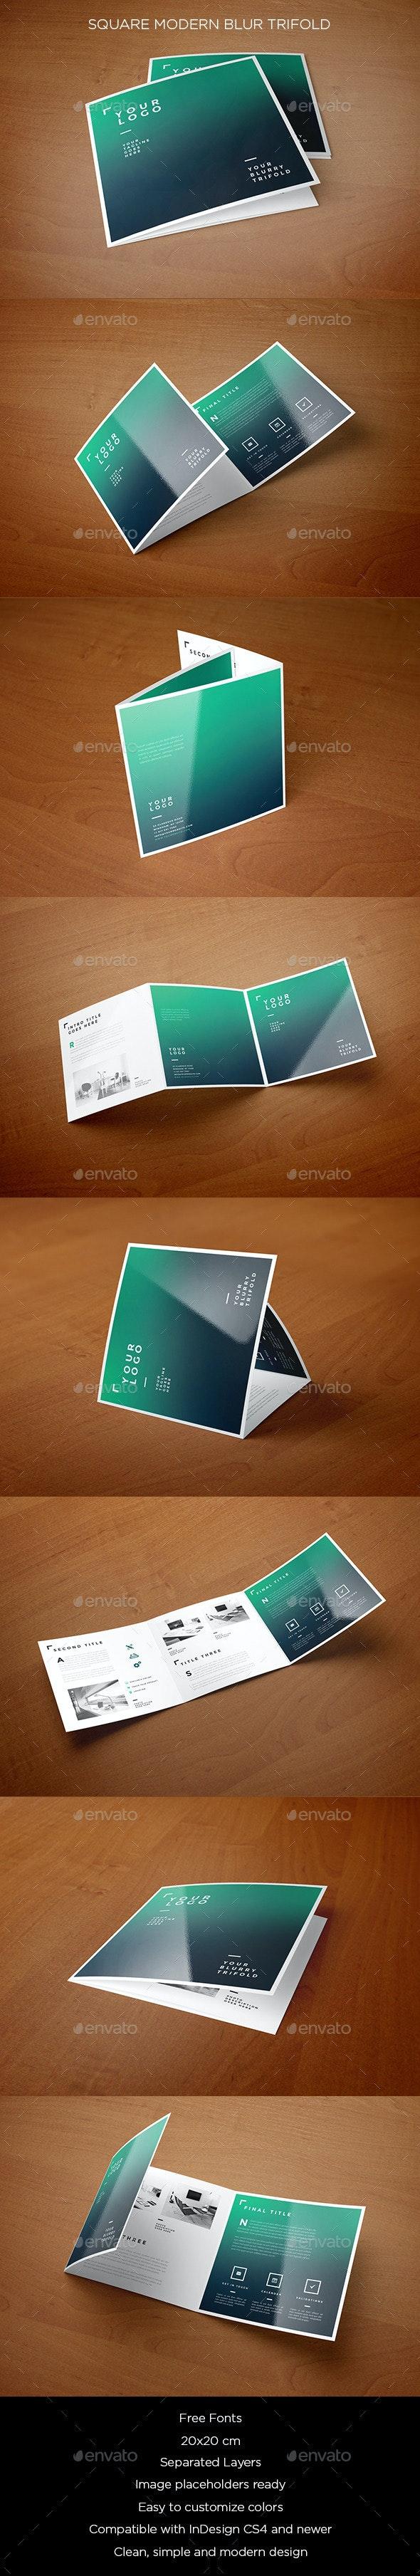 Square Modern Blur Trifold - Brochures Print Templates